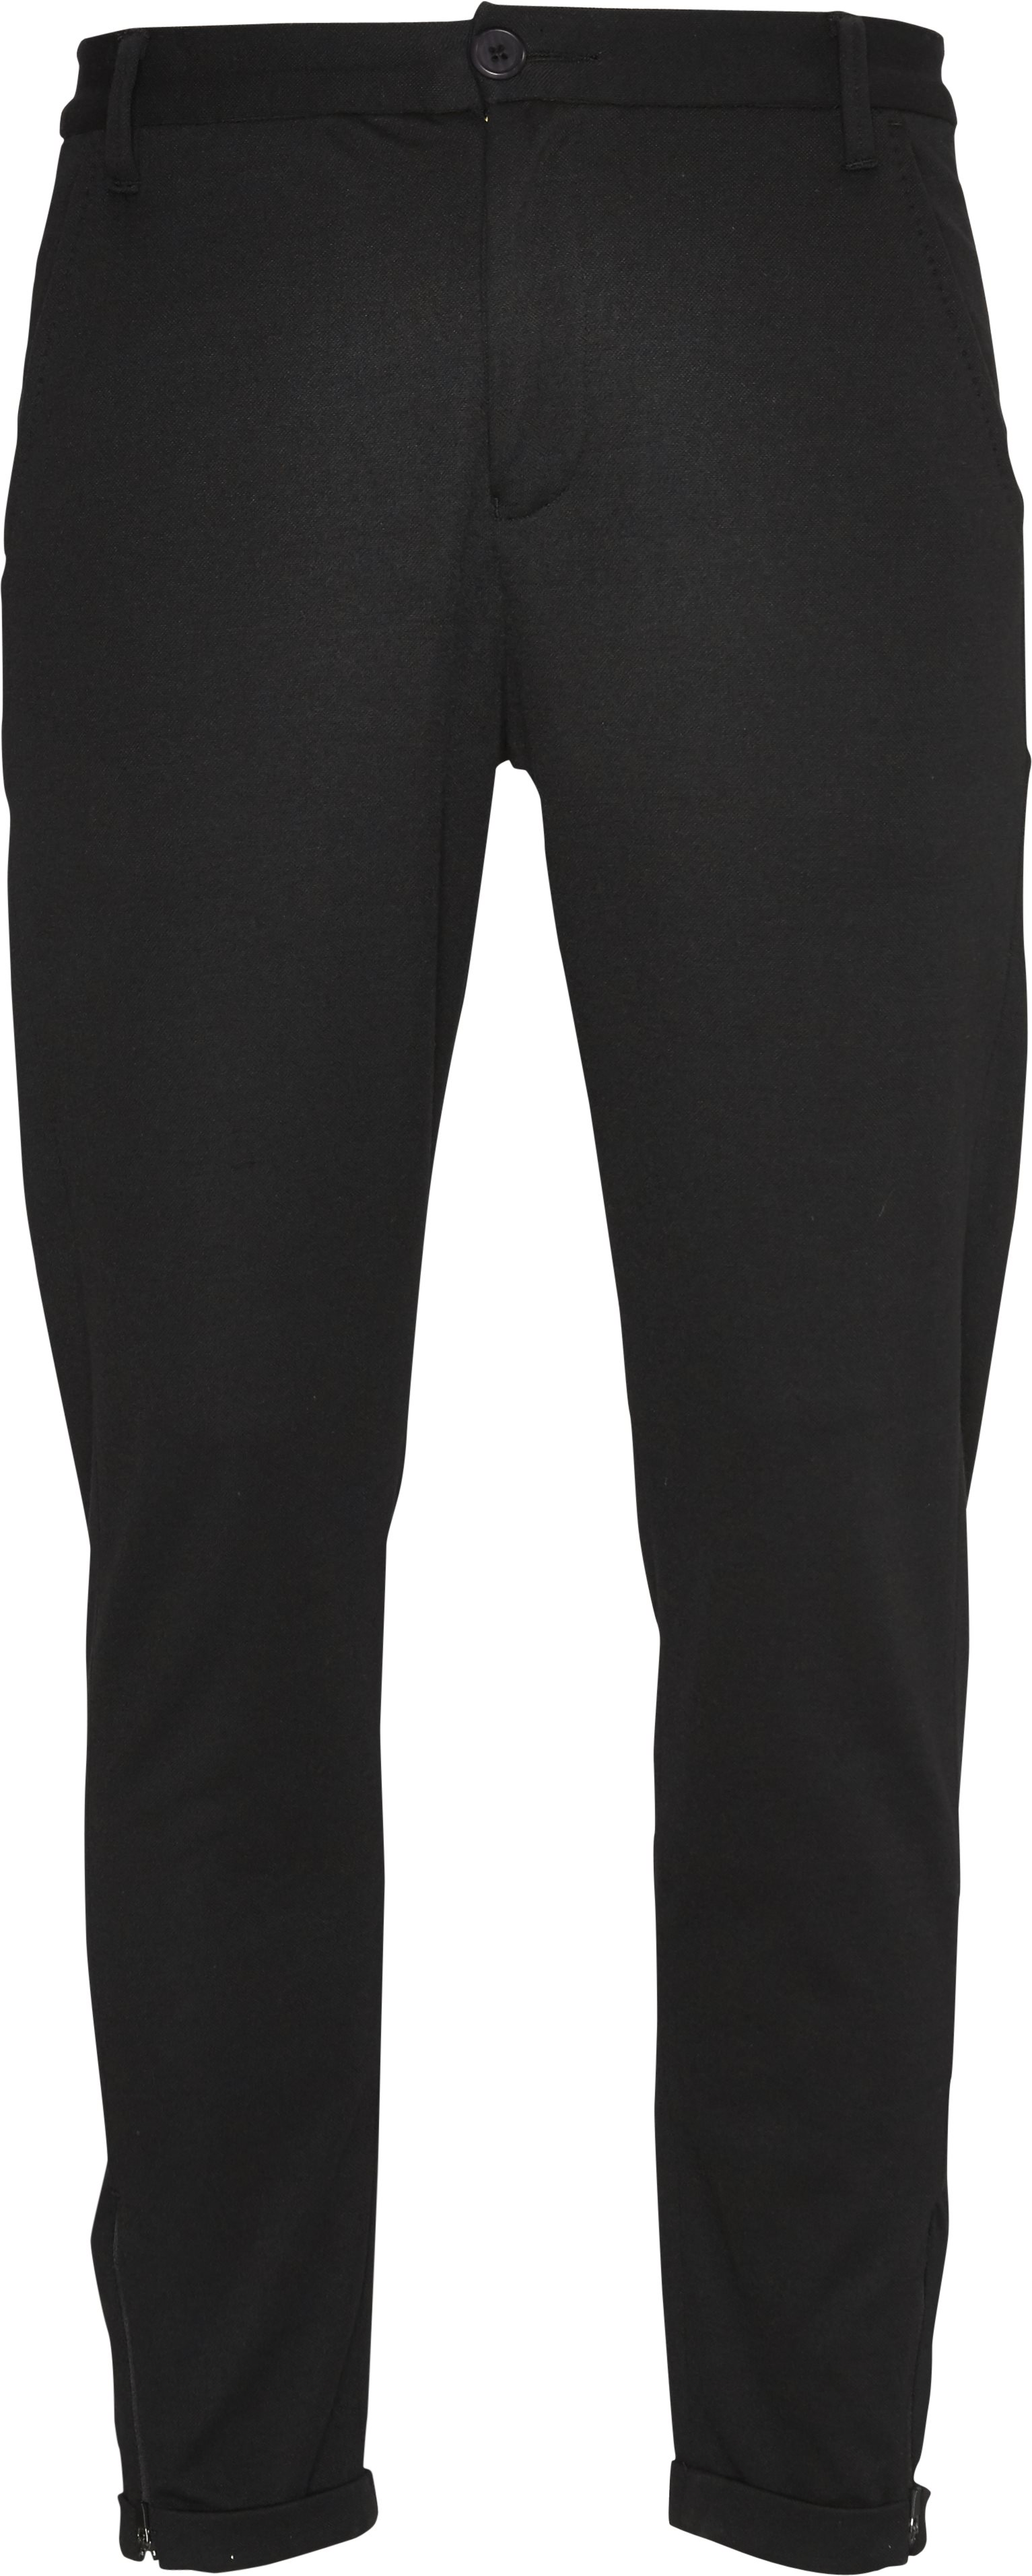 Pisa Jersey Bukser - Bukser - Tapered fit - Sort